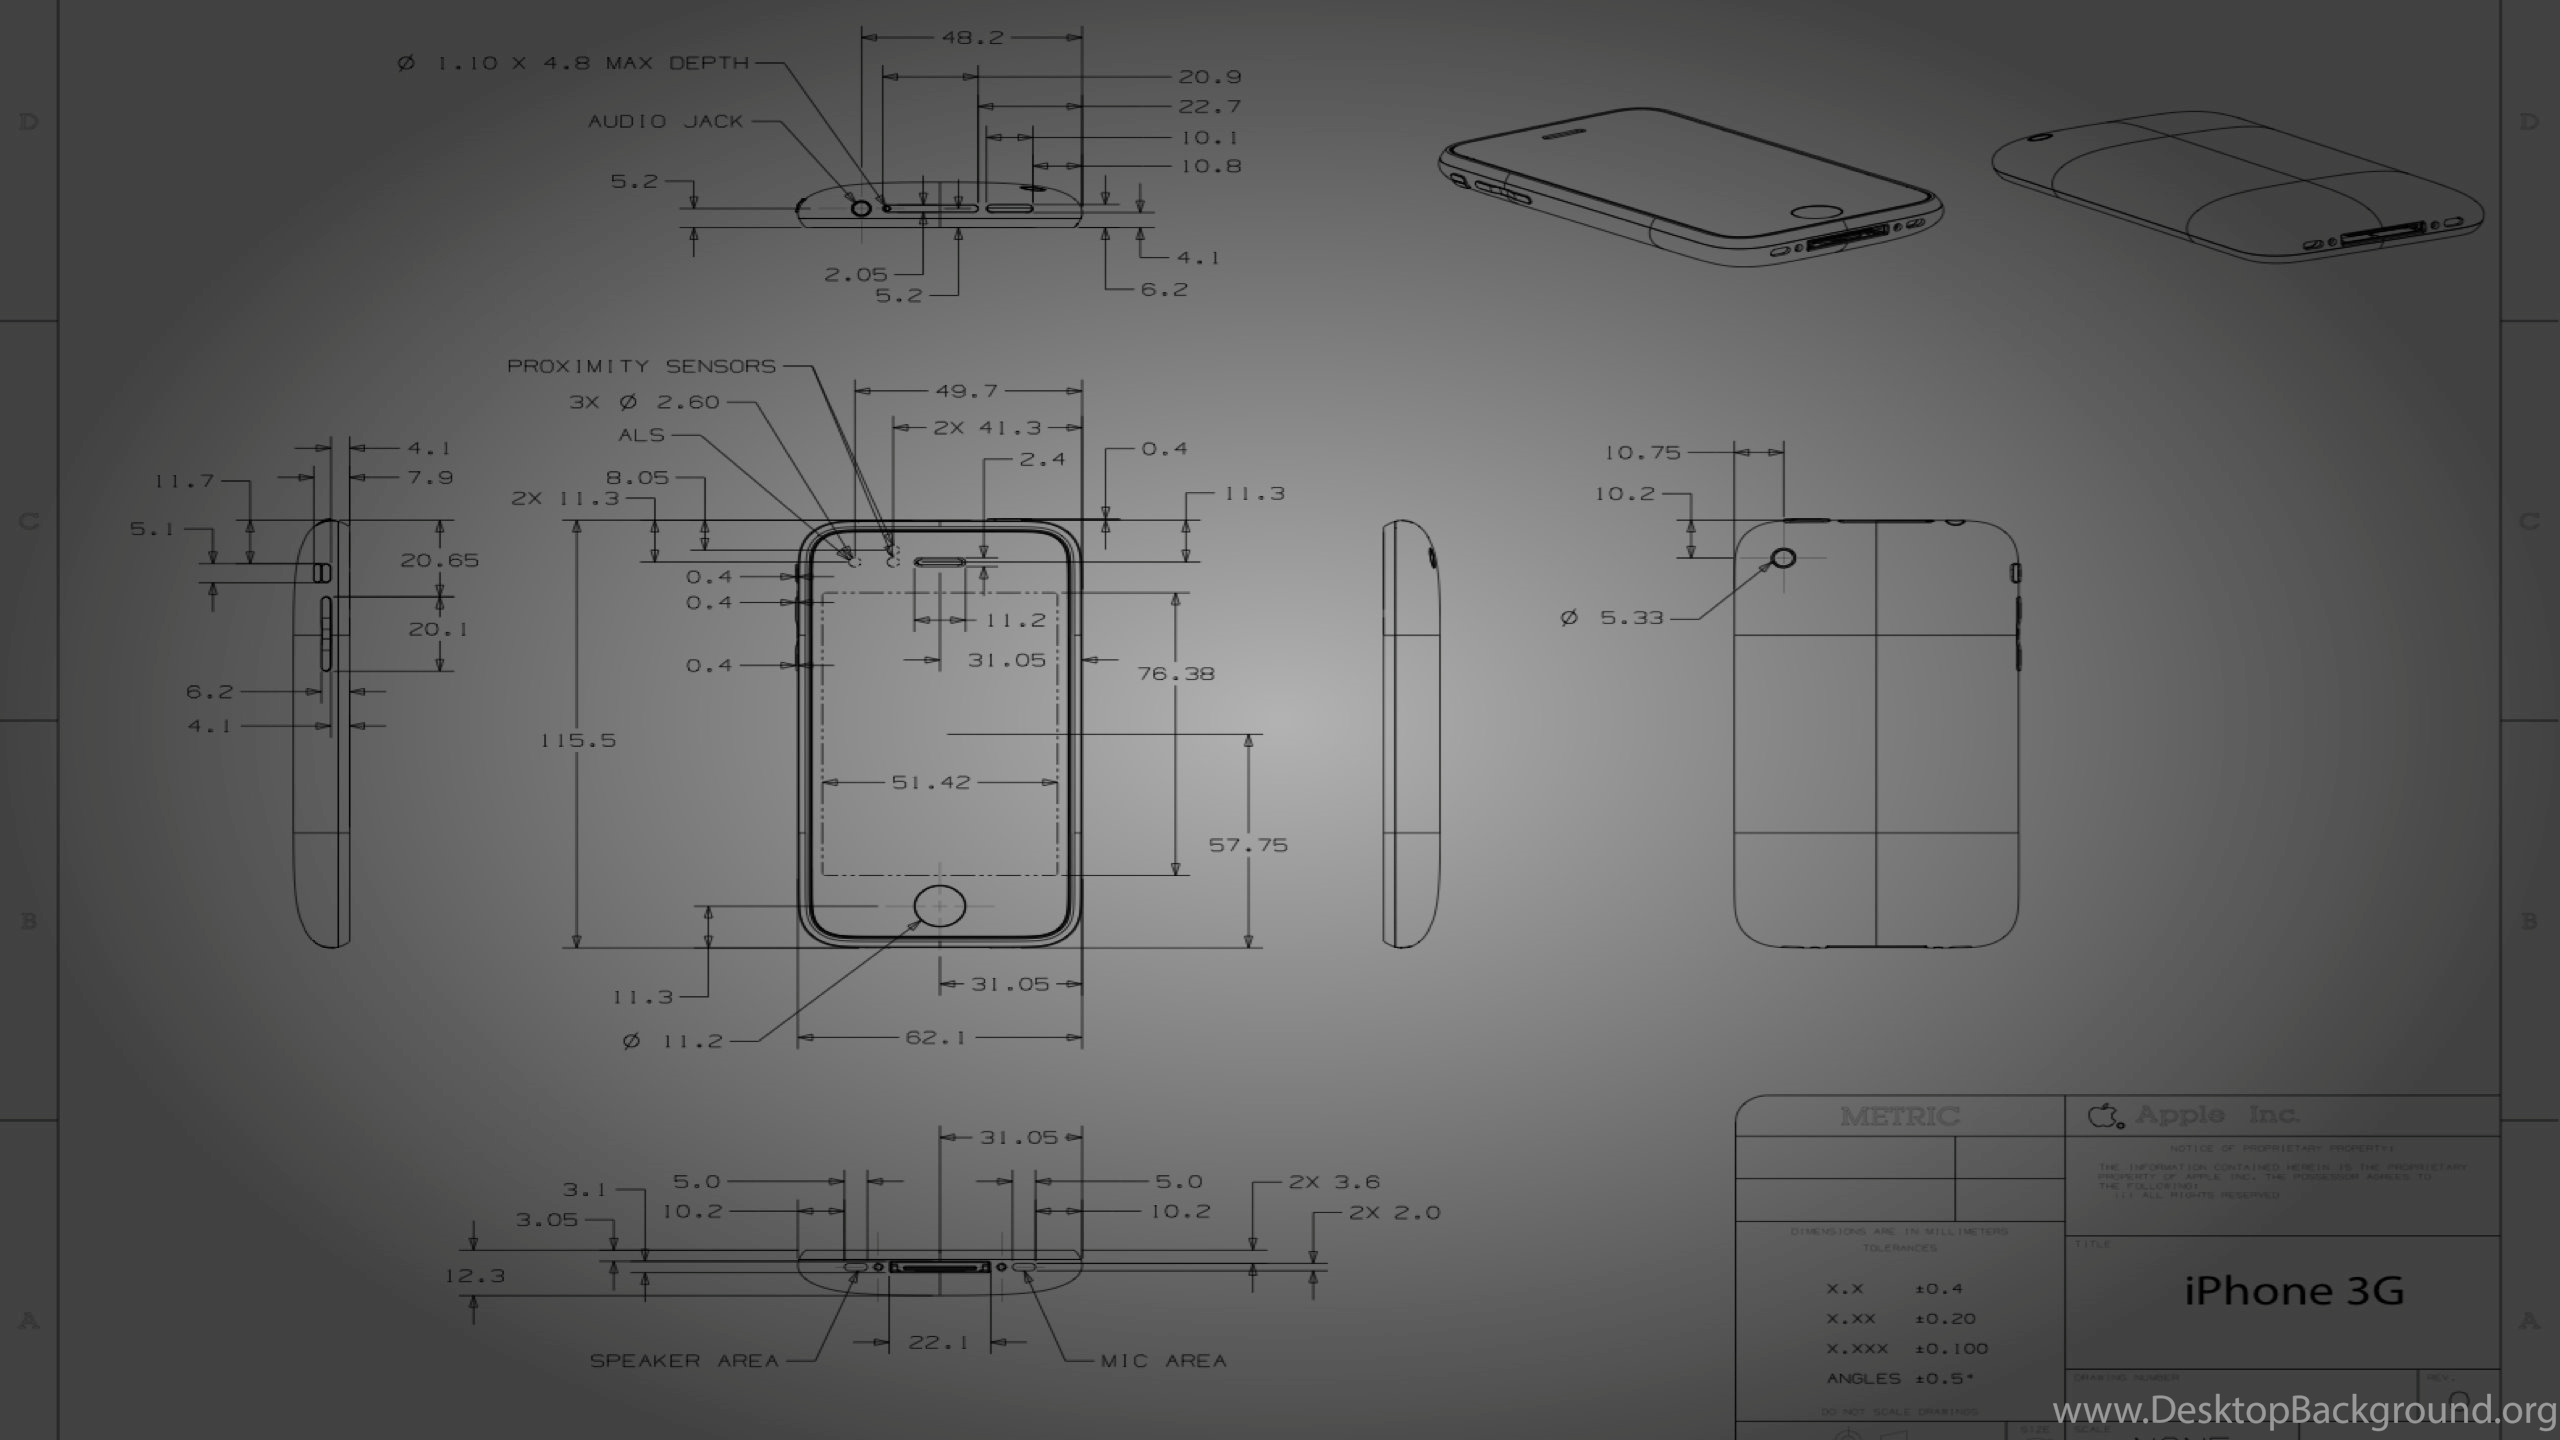 Iphone 3g blueprint wallpapers desktop background netbook malvernweather Images